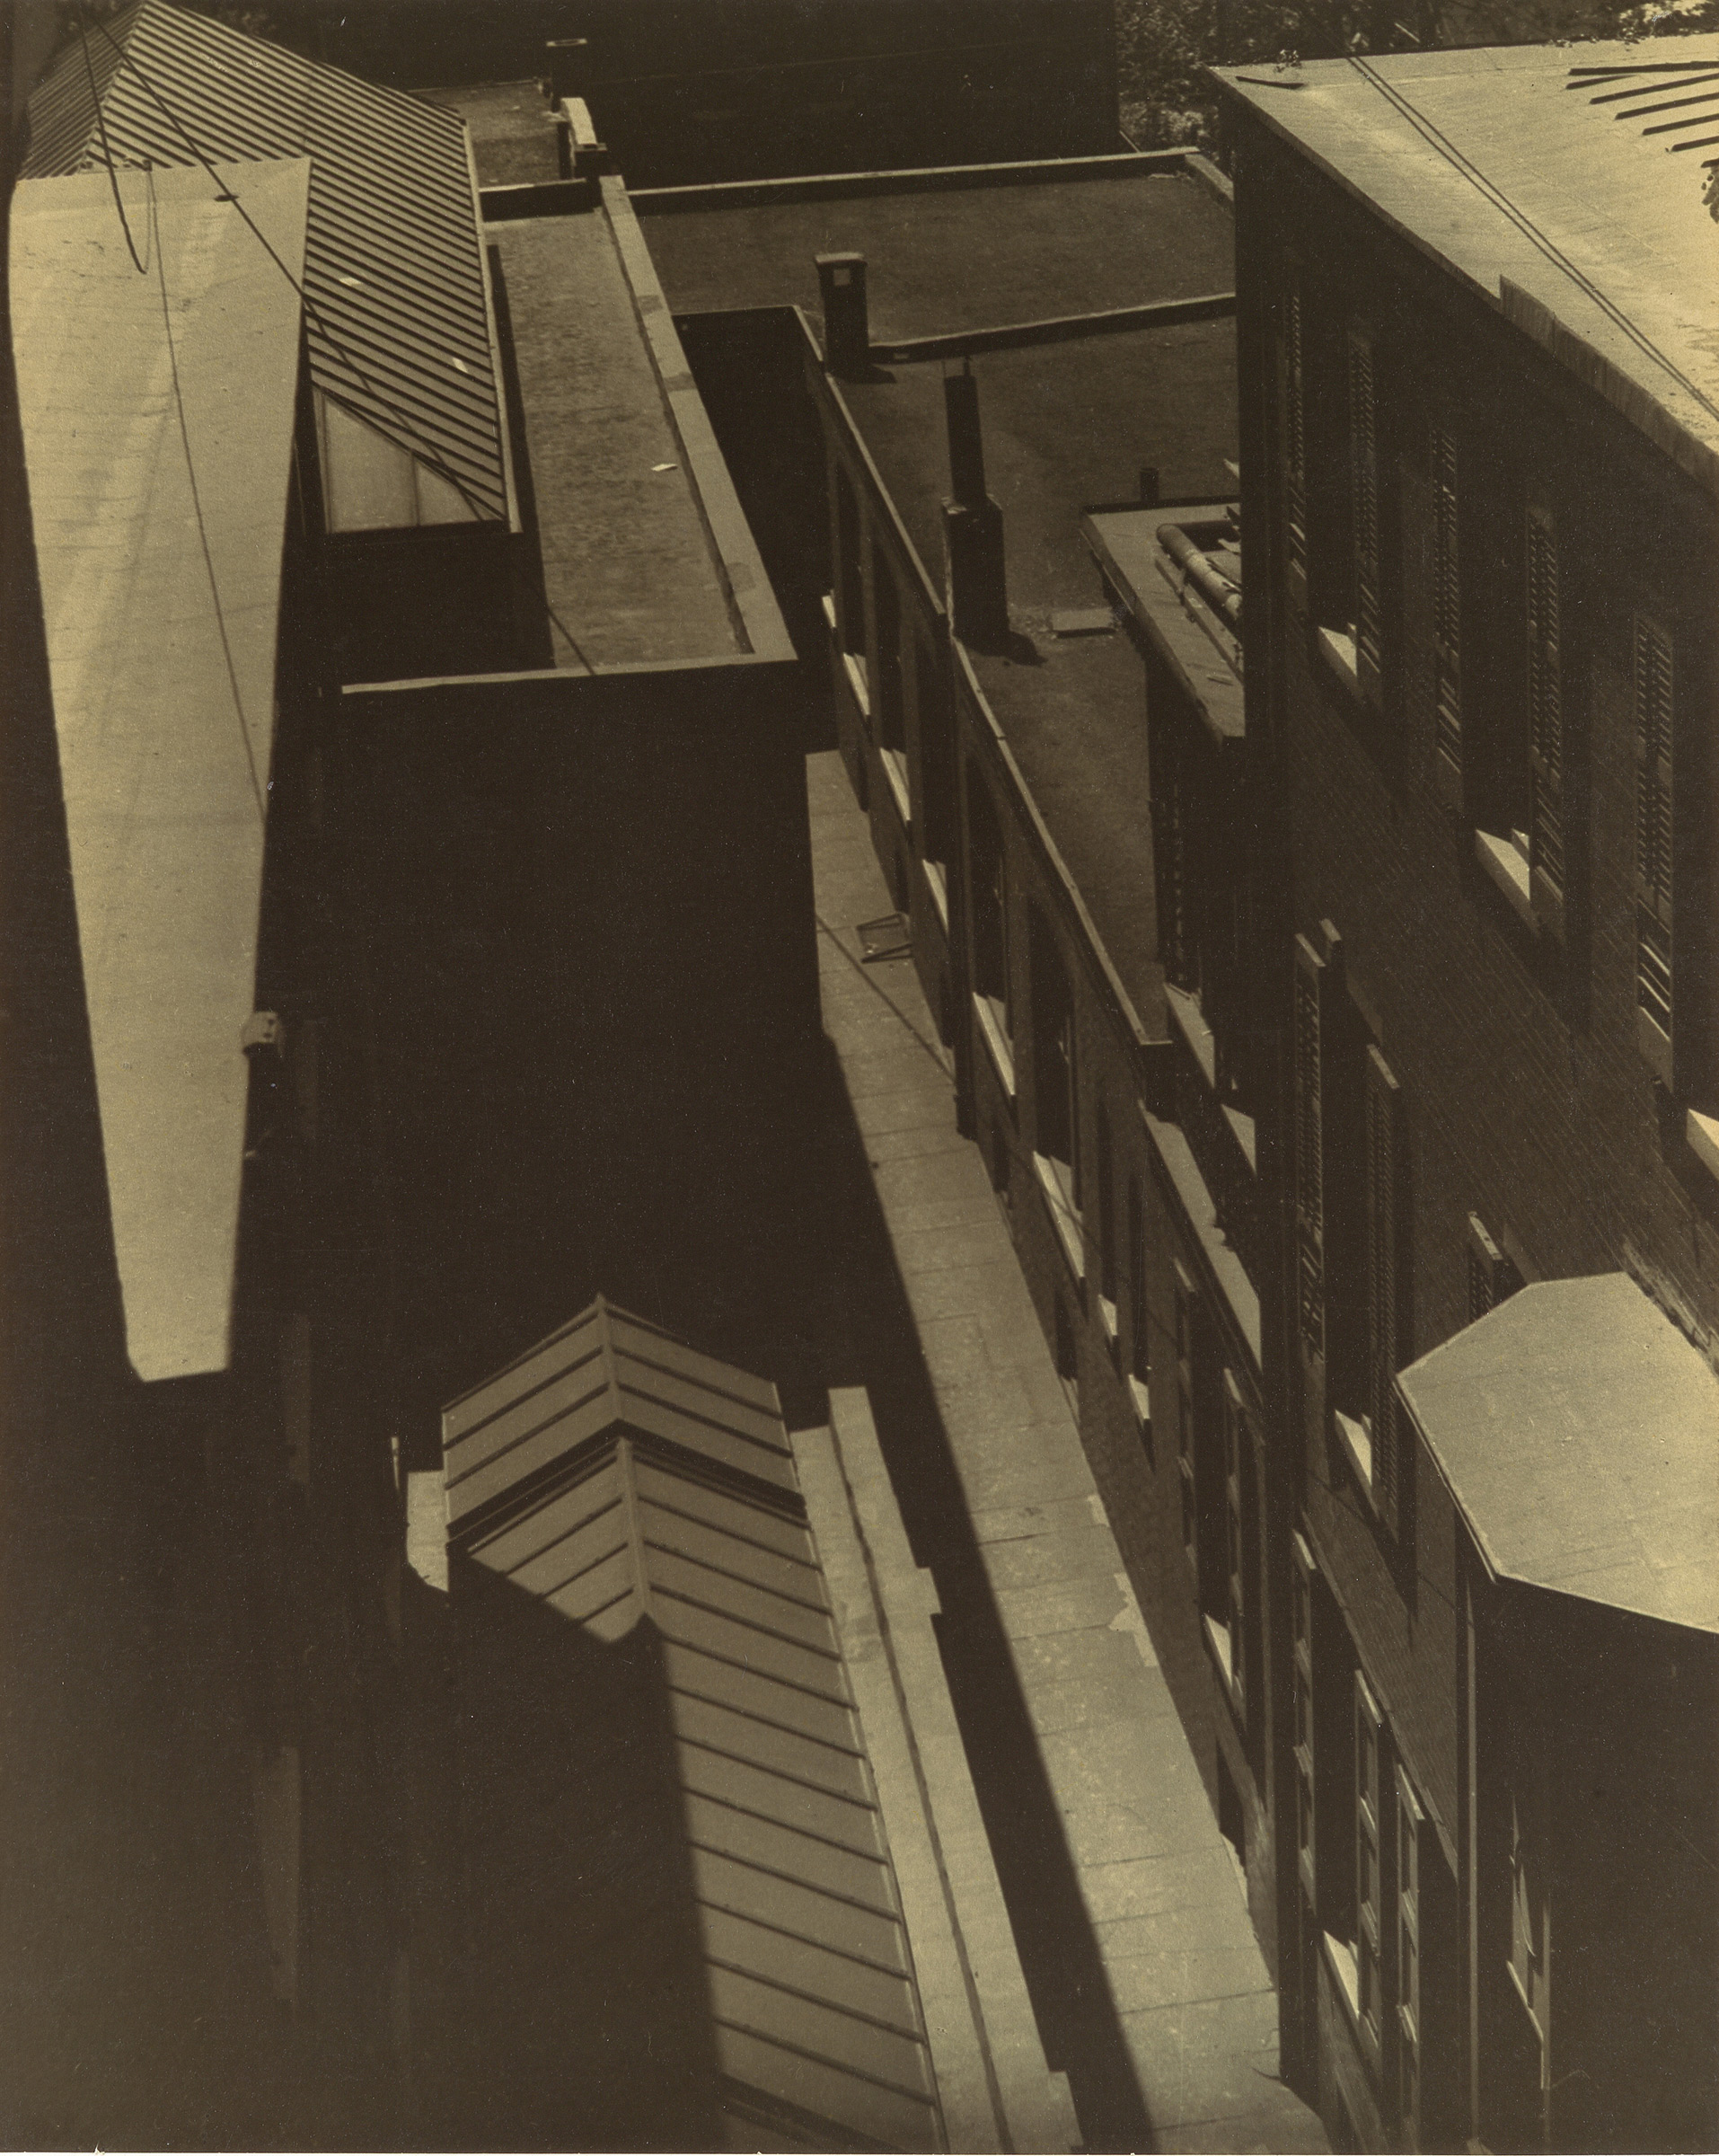 Morton Schamberg's  [View of Rooftops],  1917